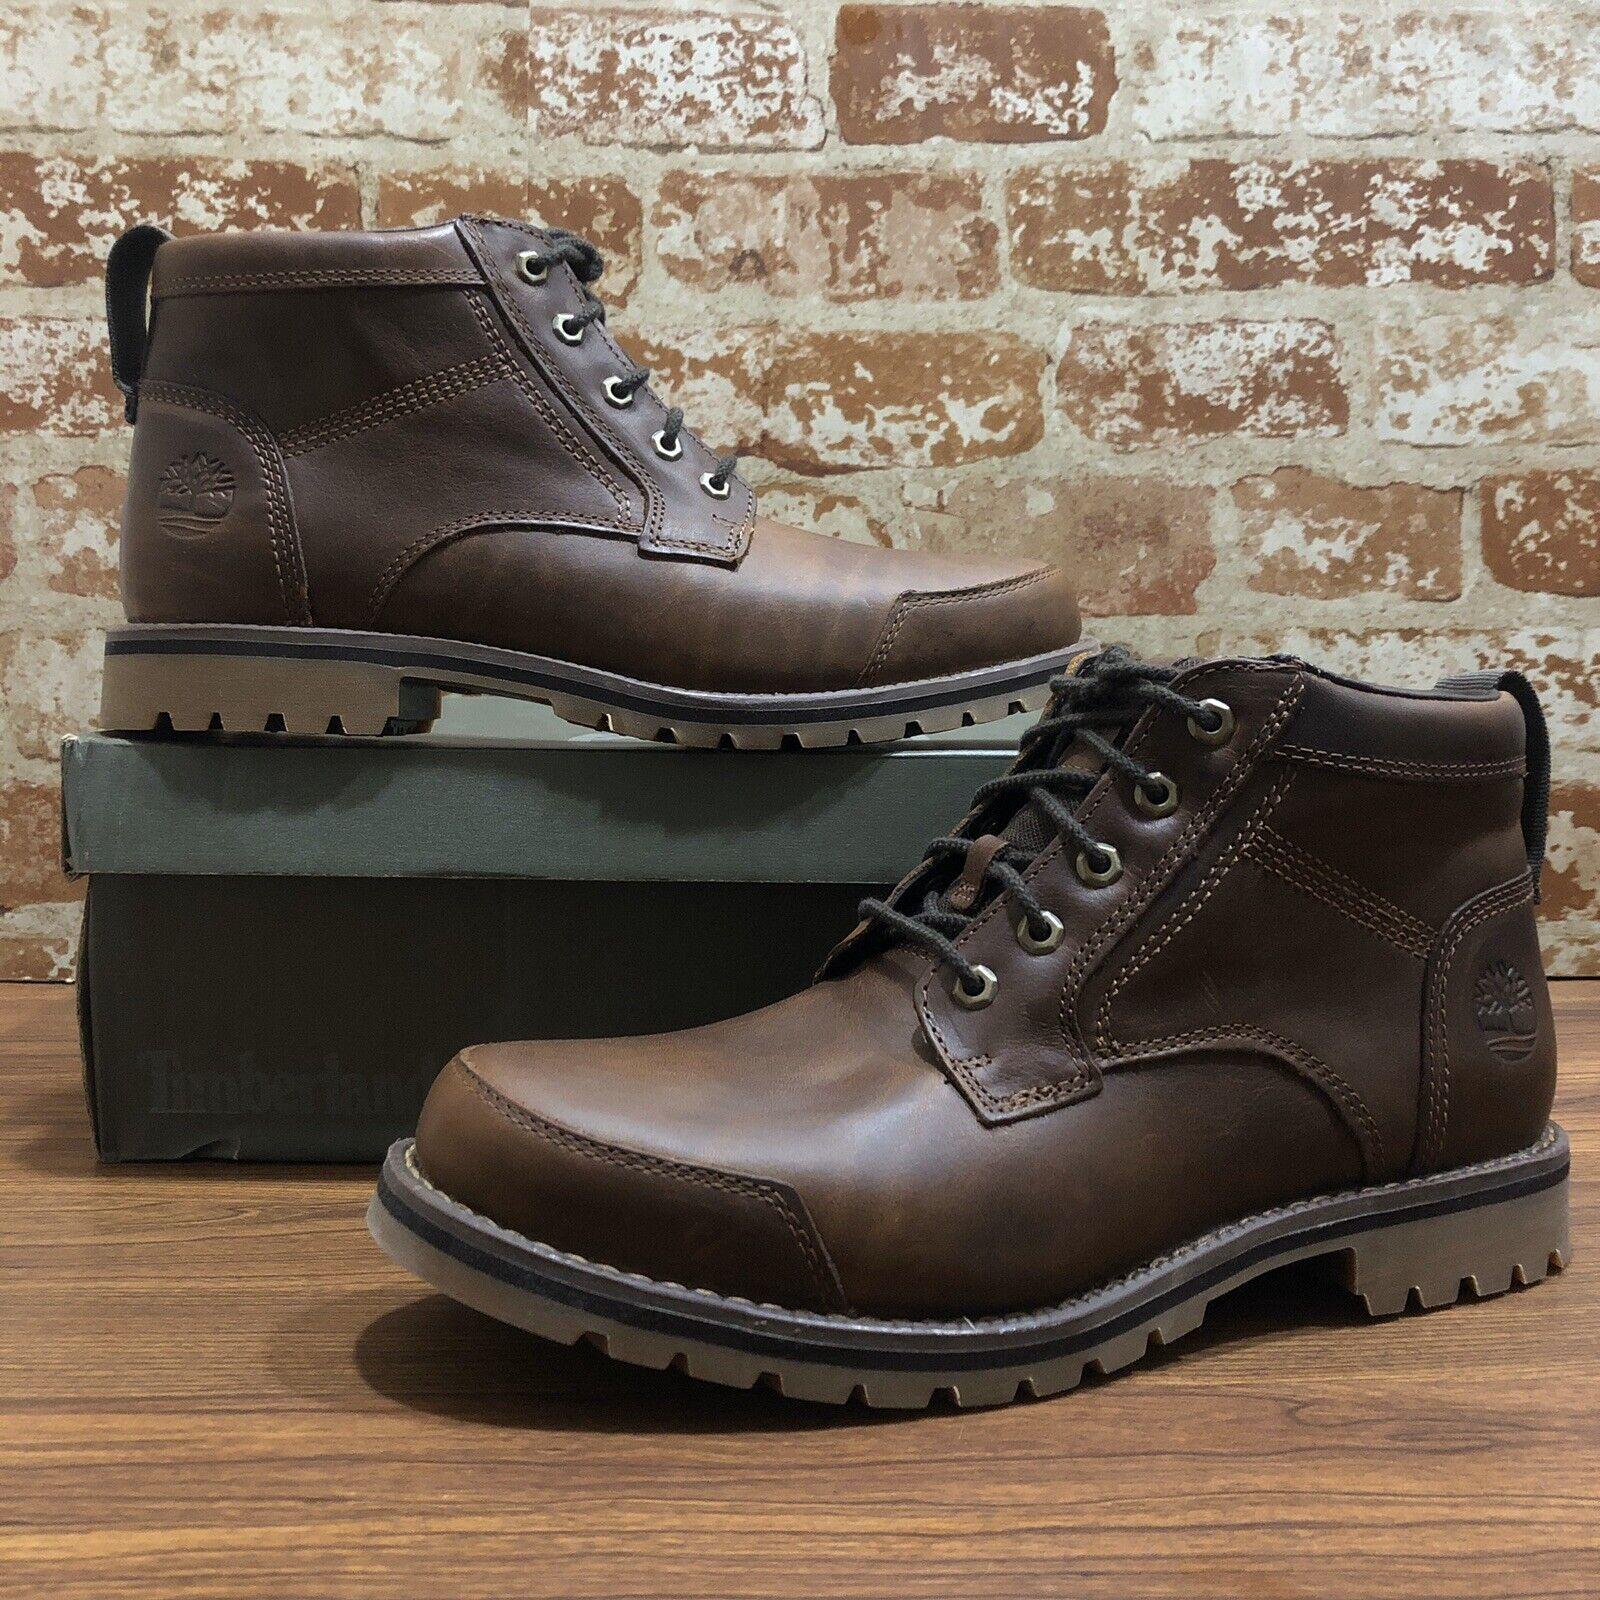 barbería lección Laboratorio  Timberland Men's Larchmont Brown Full Grain Leather Chukka BOOTS A1yxu. Sz  12 for sale online | eBay